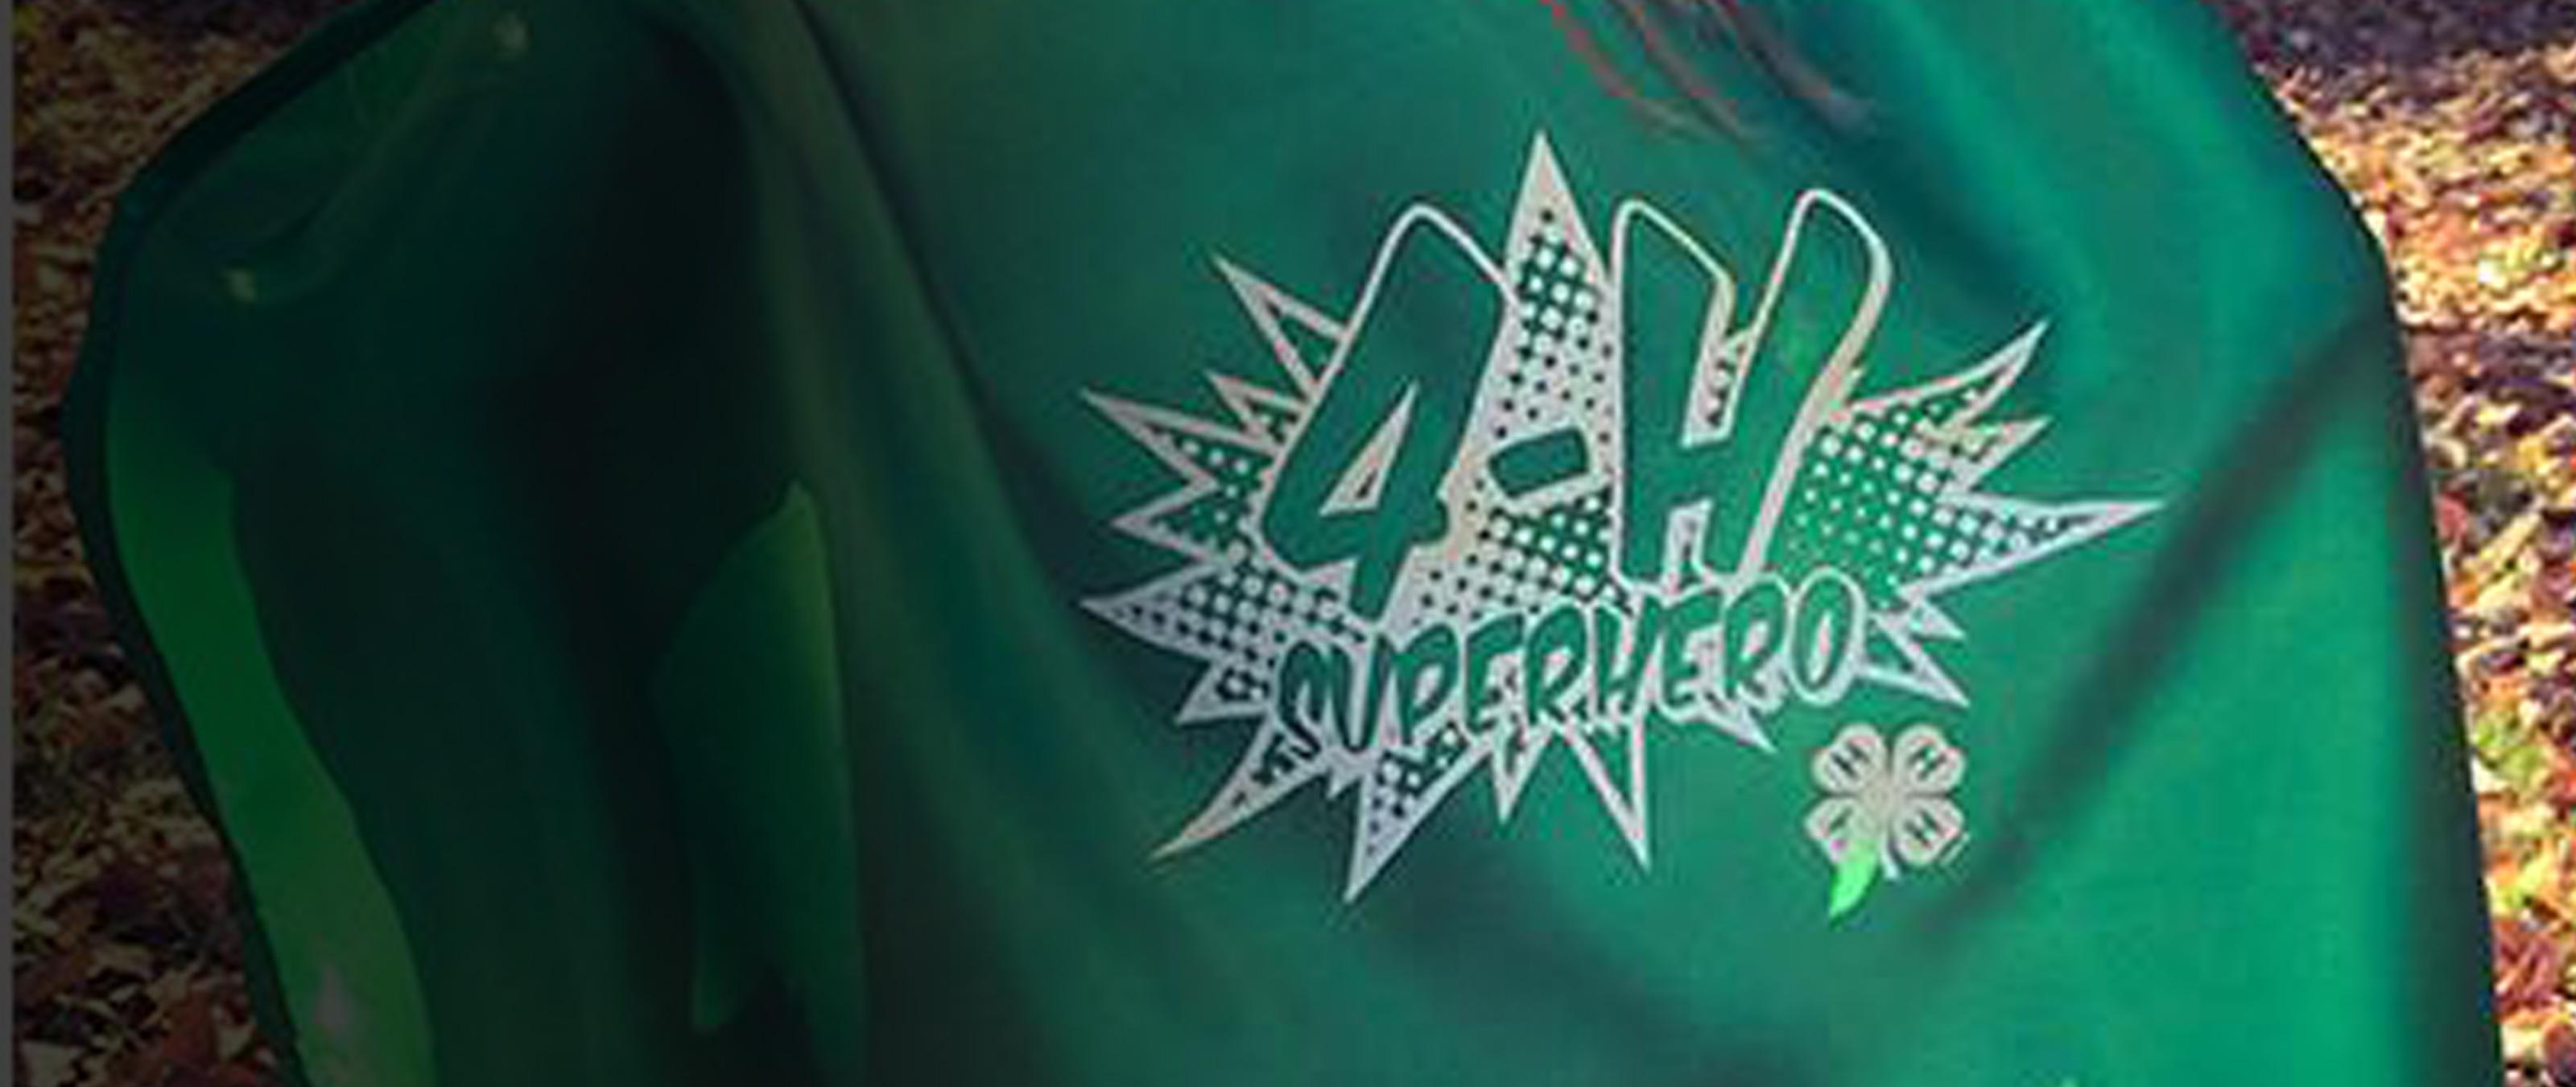 Be a 4-H superhero!